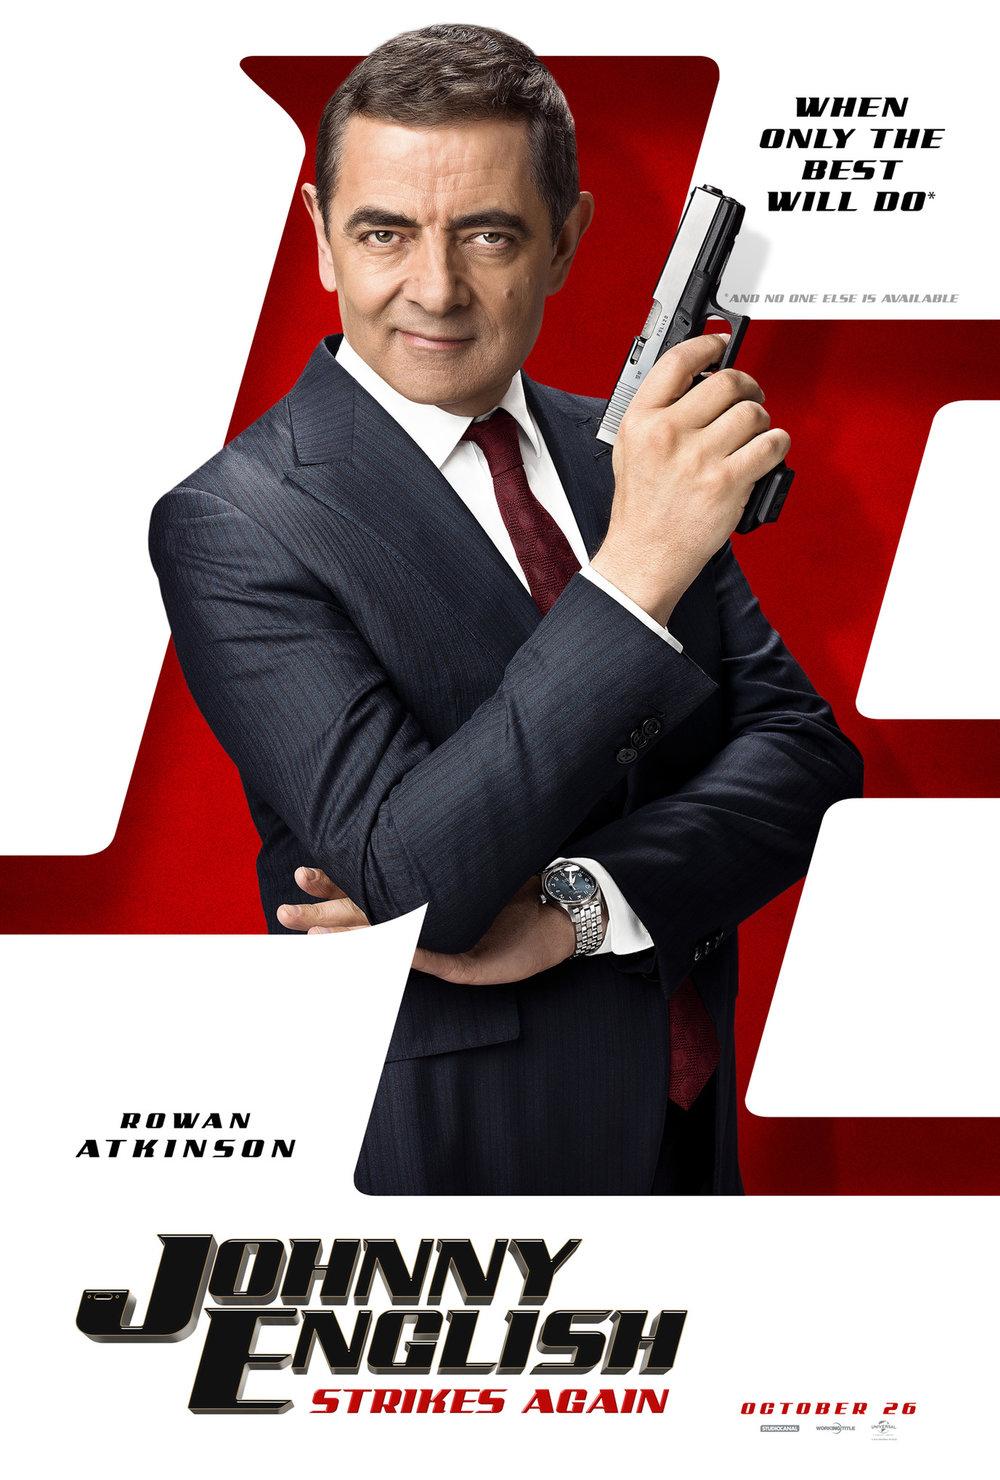 Johnny English 3 - Film 2018 - BlueBolt Ltd.